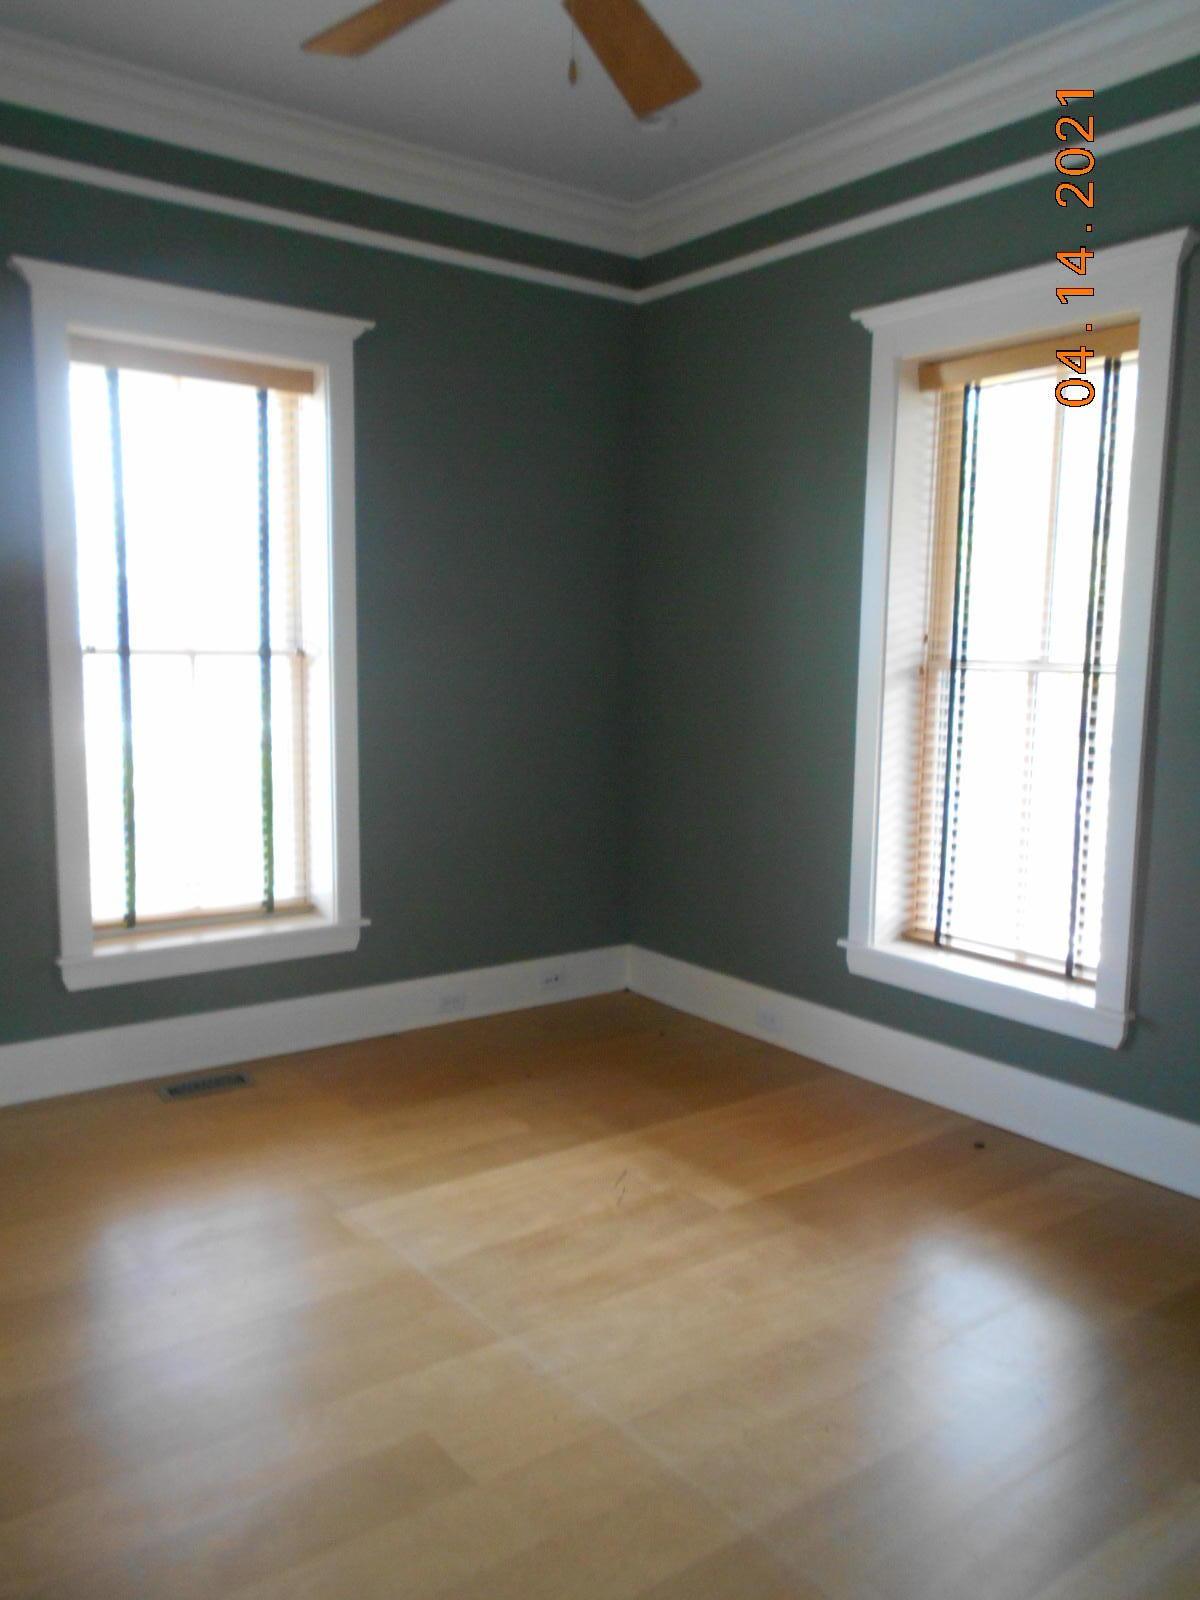 Beresford Creek Landing Homes For Sale - 1212 Winding Creek, Charleston, SC - 20